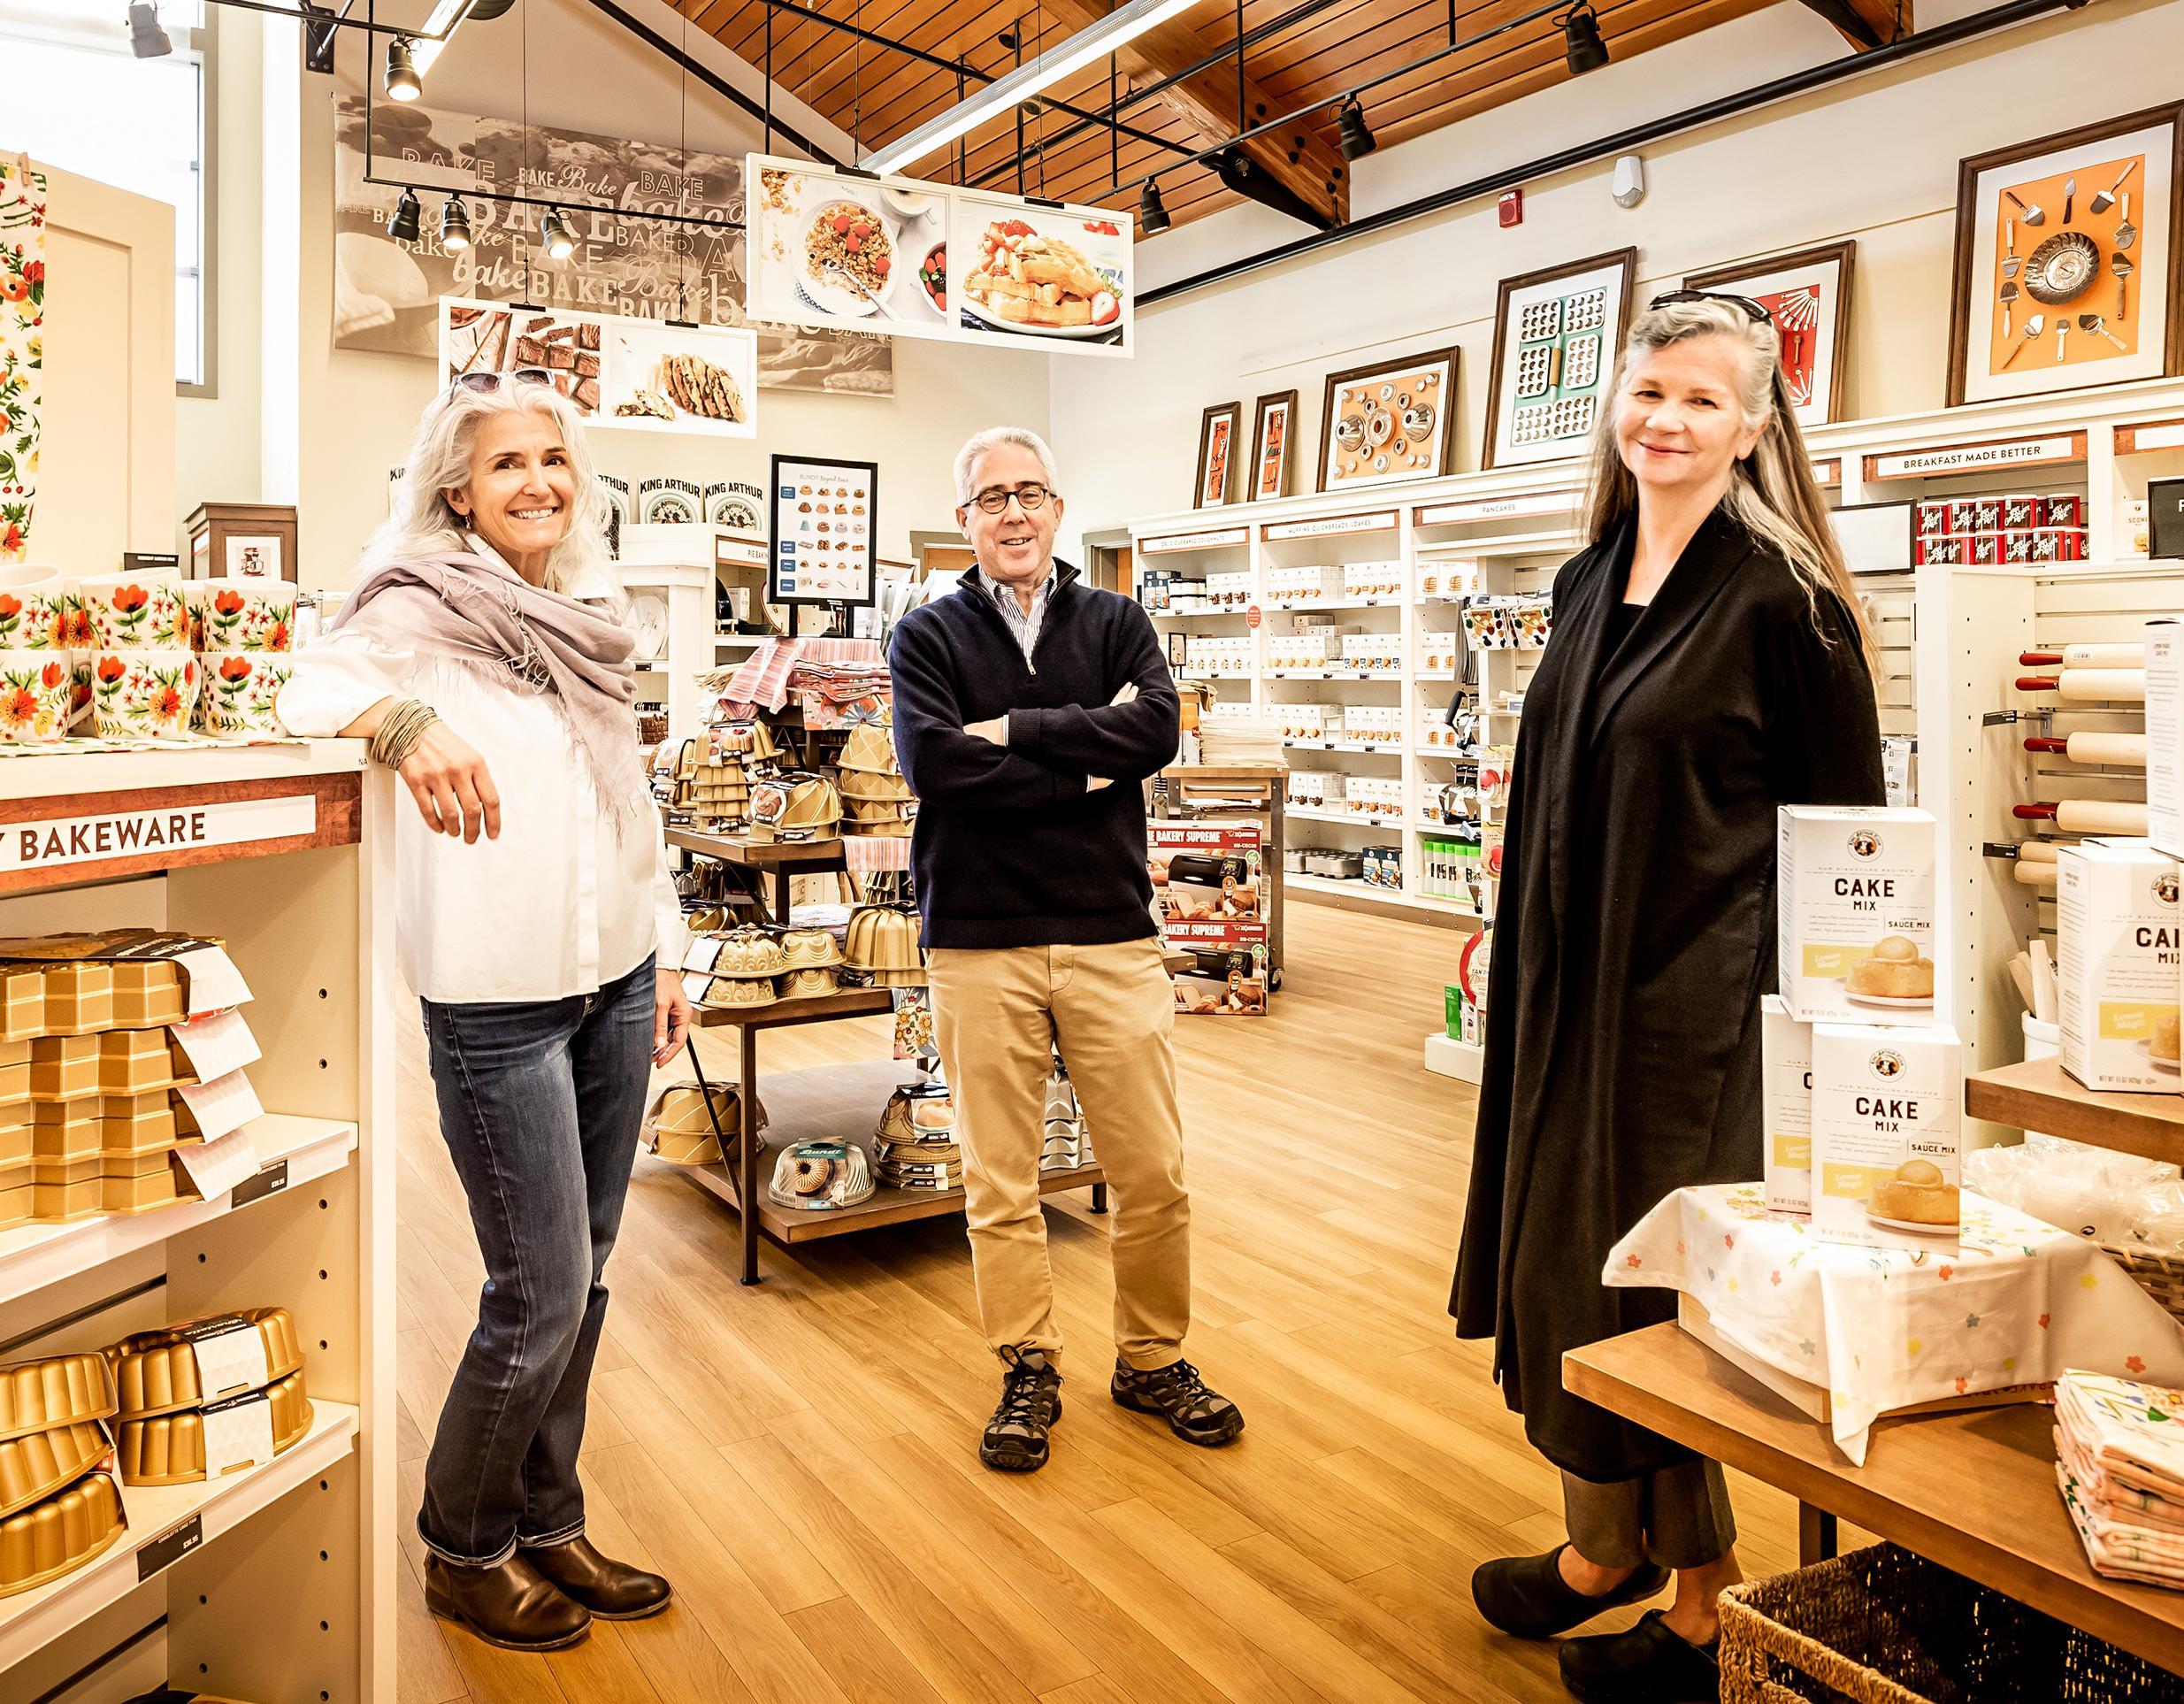 King Arthur Flour, flour, baking, small business, entrepreneurs, Vermont, Karen Colberg, Ralph Carlton, Suzanne McDowell,